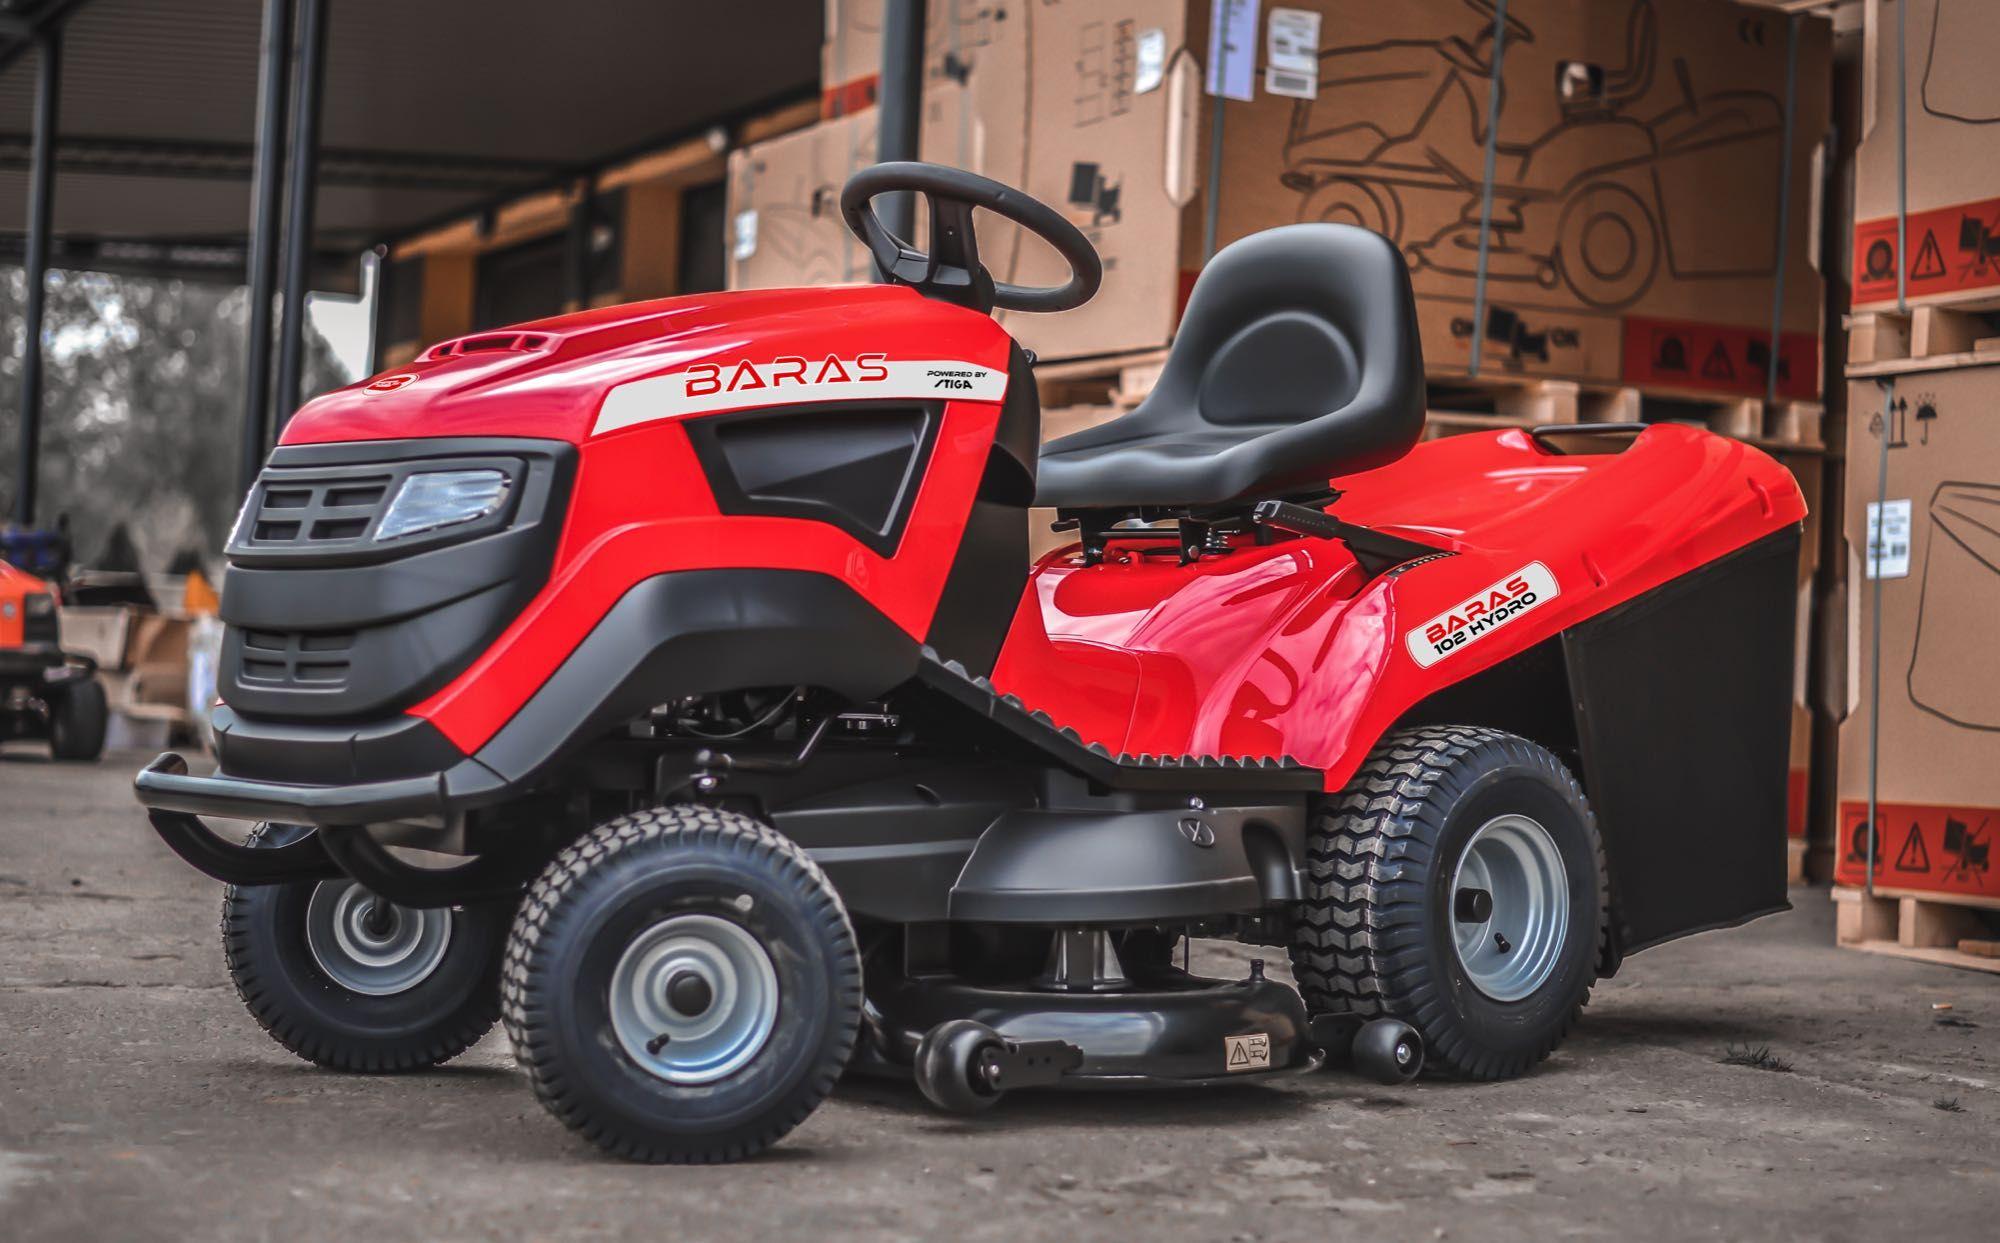 Traktorek ogrodowy BARAS 102 Hydro powered by Stiga 6102!